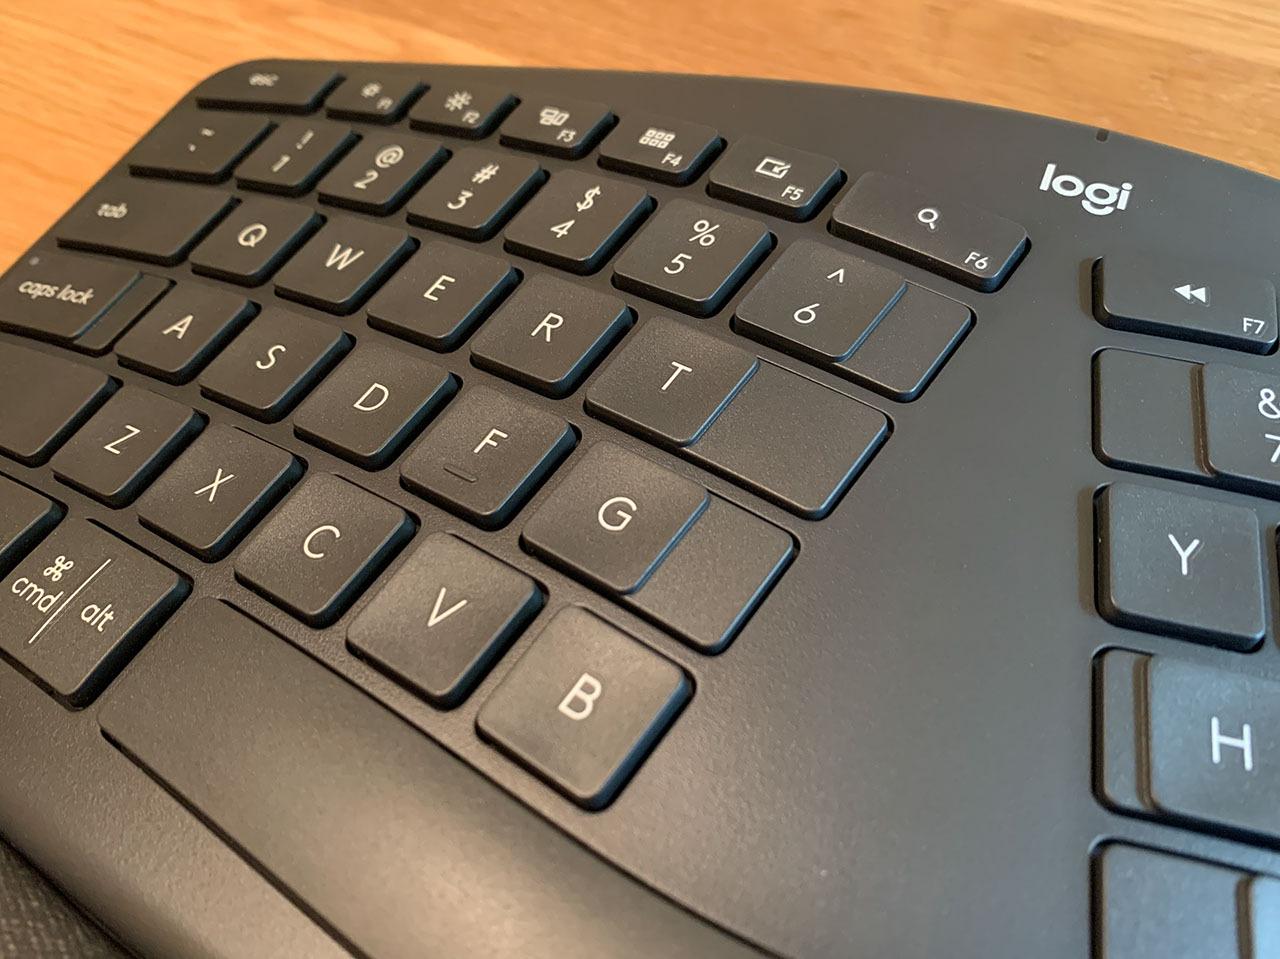 Левая клавиша беспроводной клавиатуры Logitech Ergo K860 Wireless Keyboard